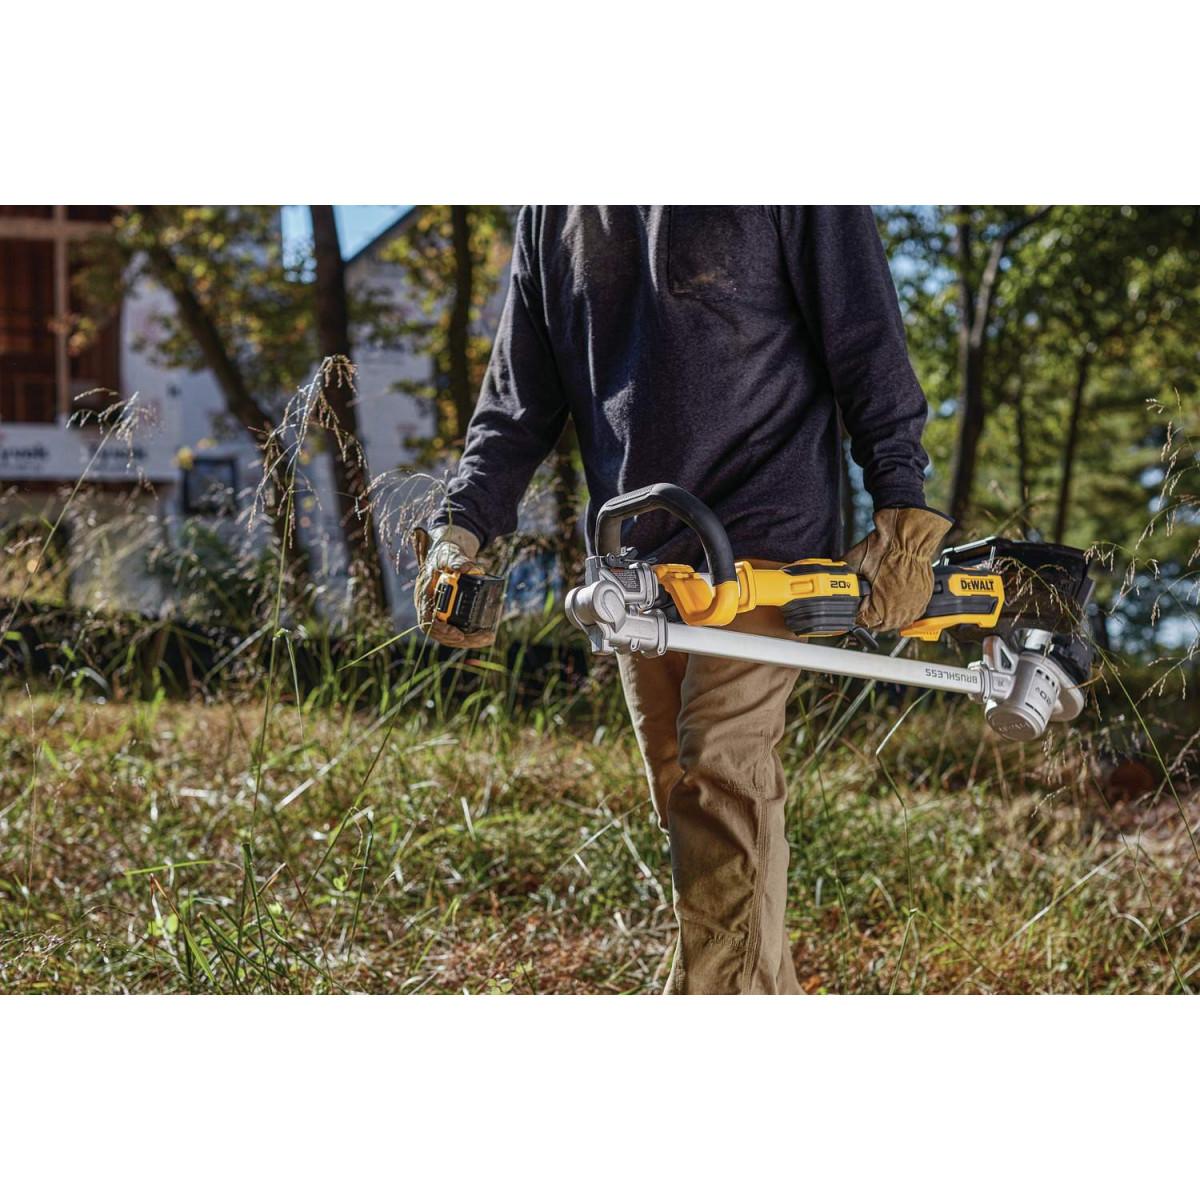 "DeWALT DCST922B 20V MAX Cordless 14"" String Trimmer (Bare Tool)"